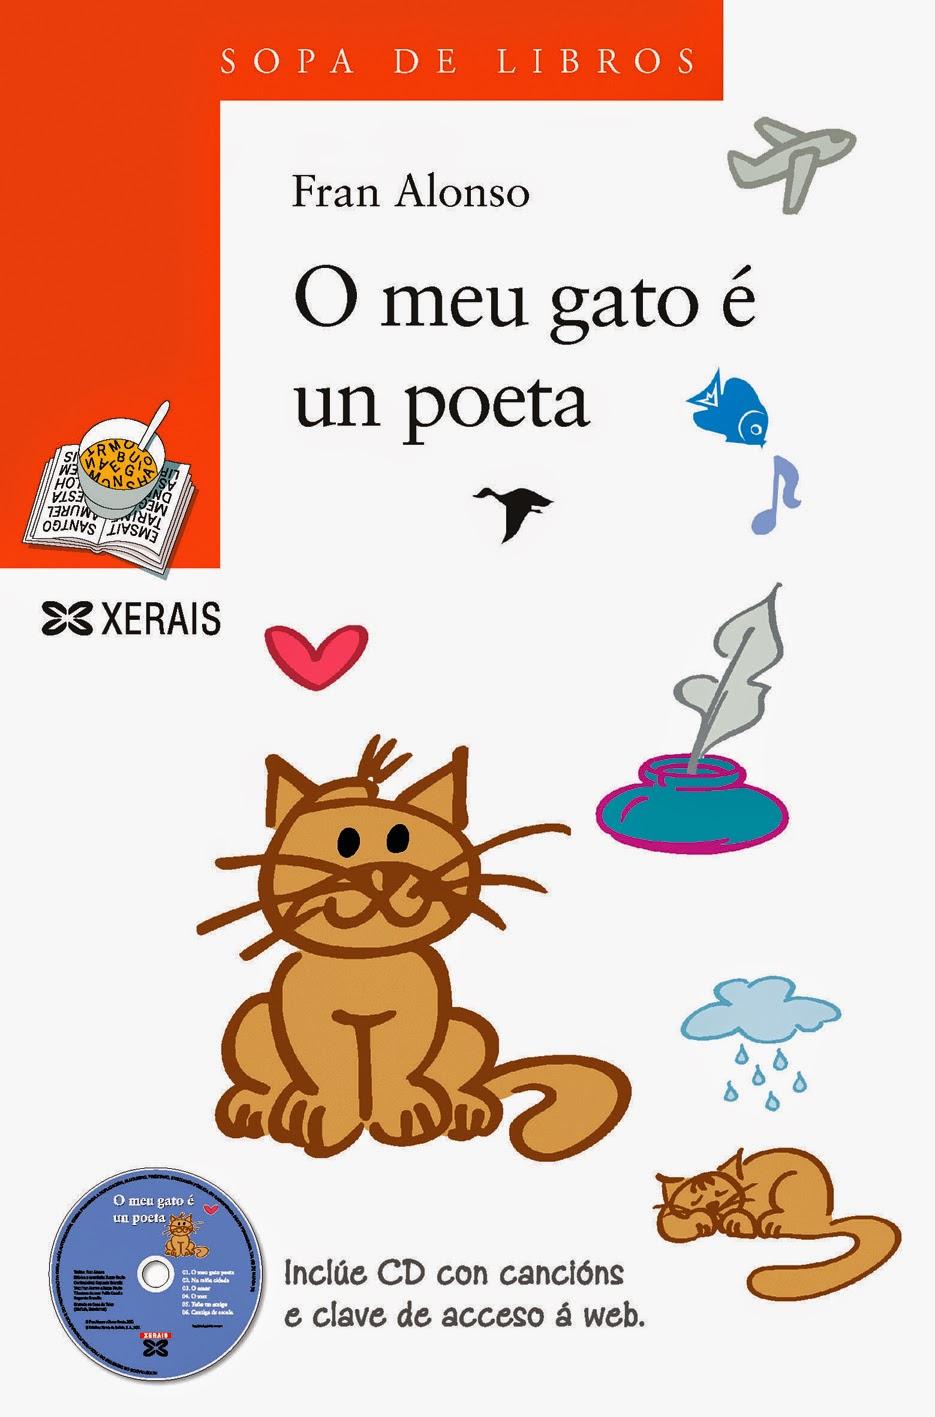 http://gatopoeta.net/